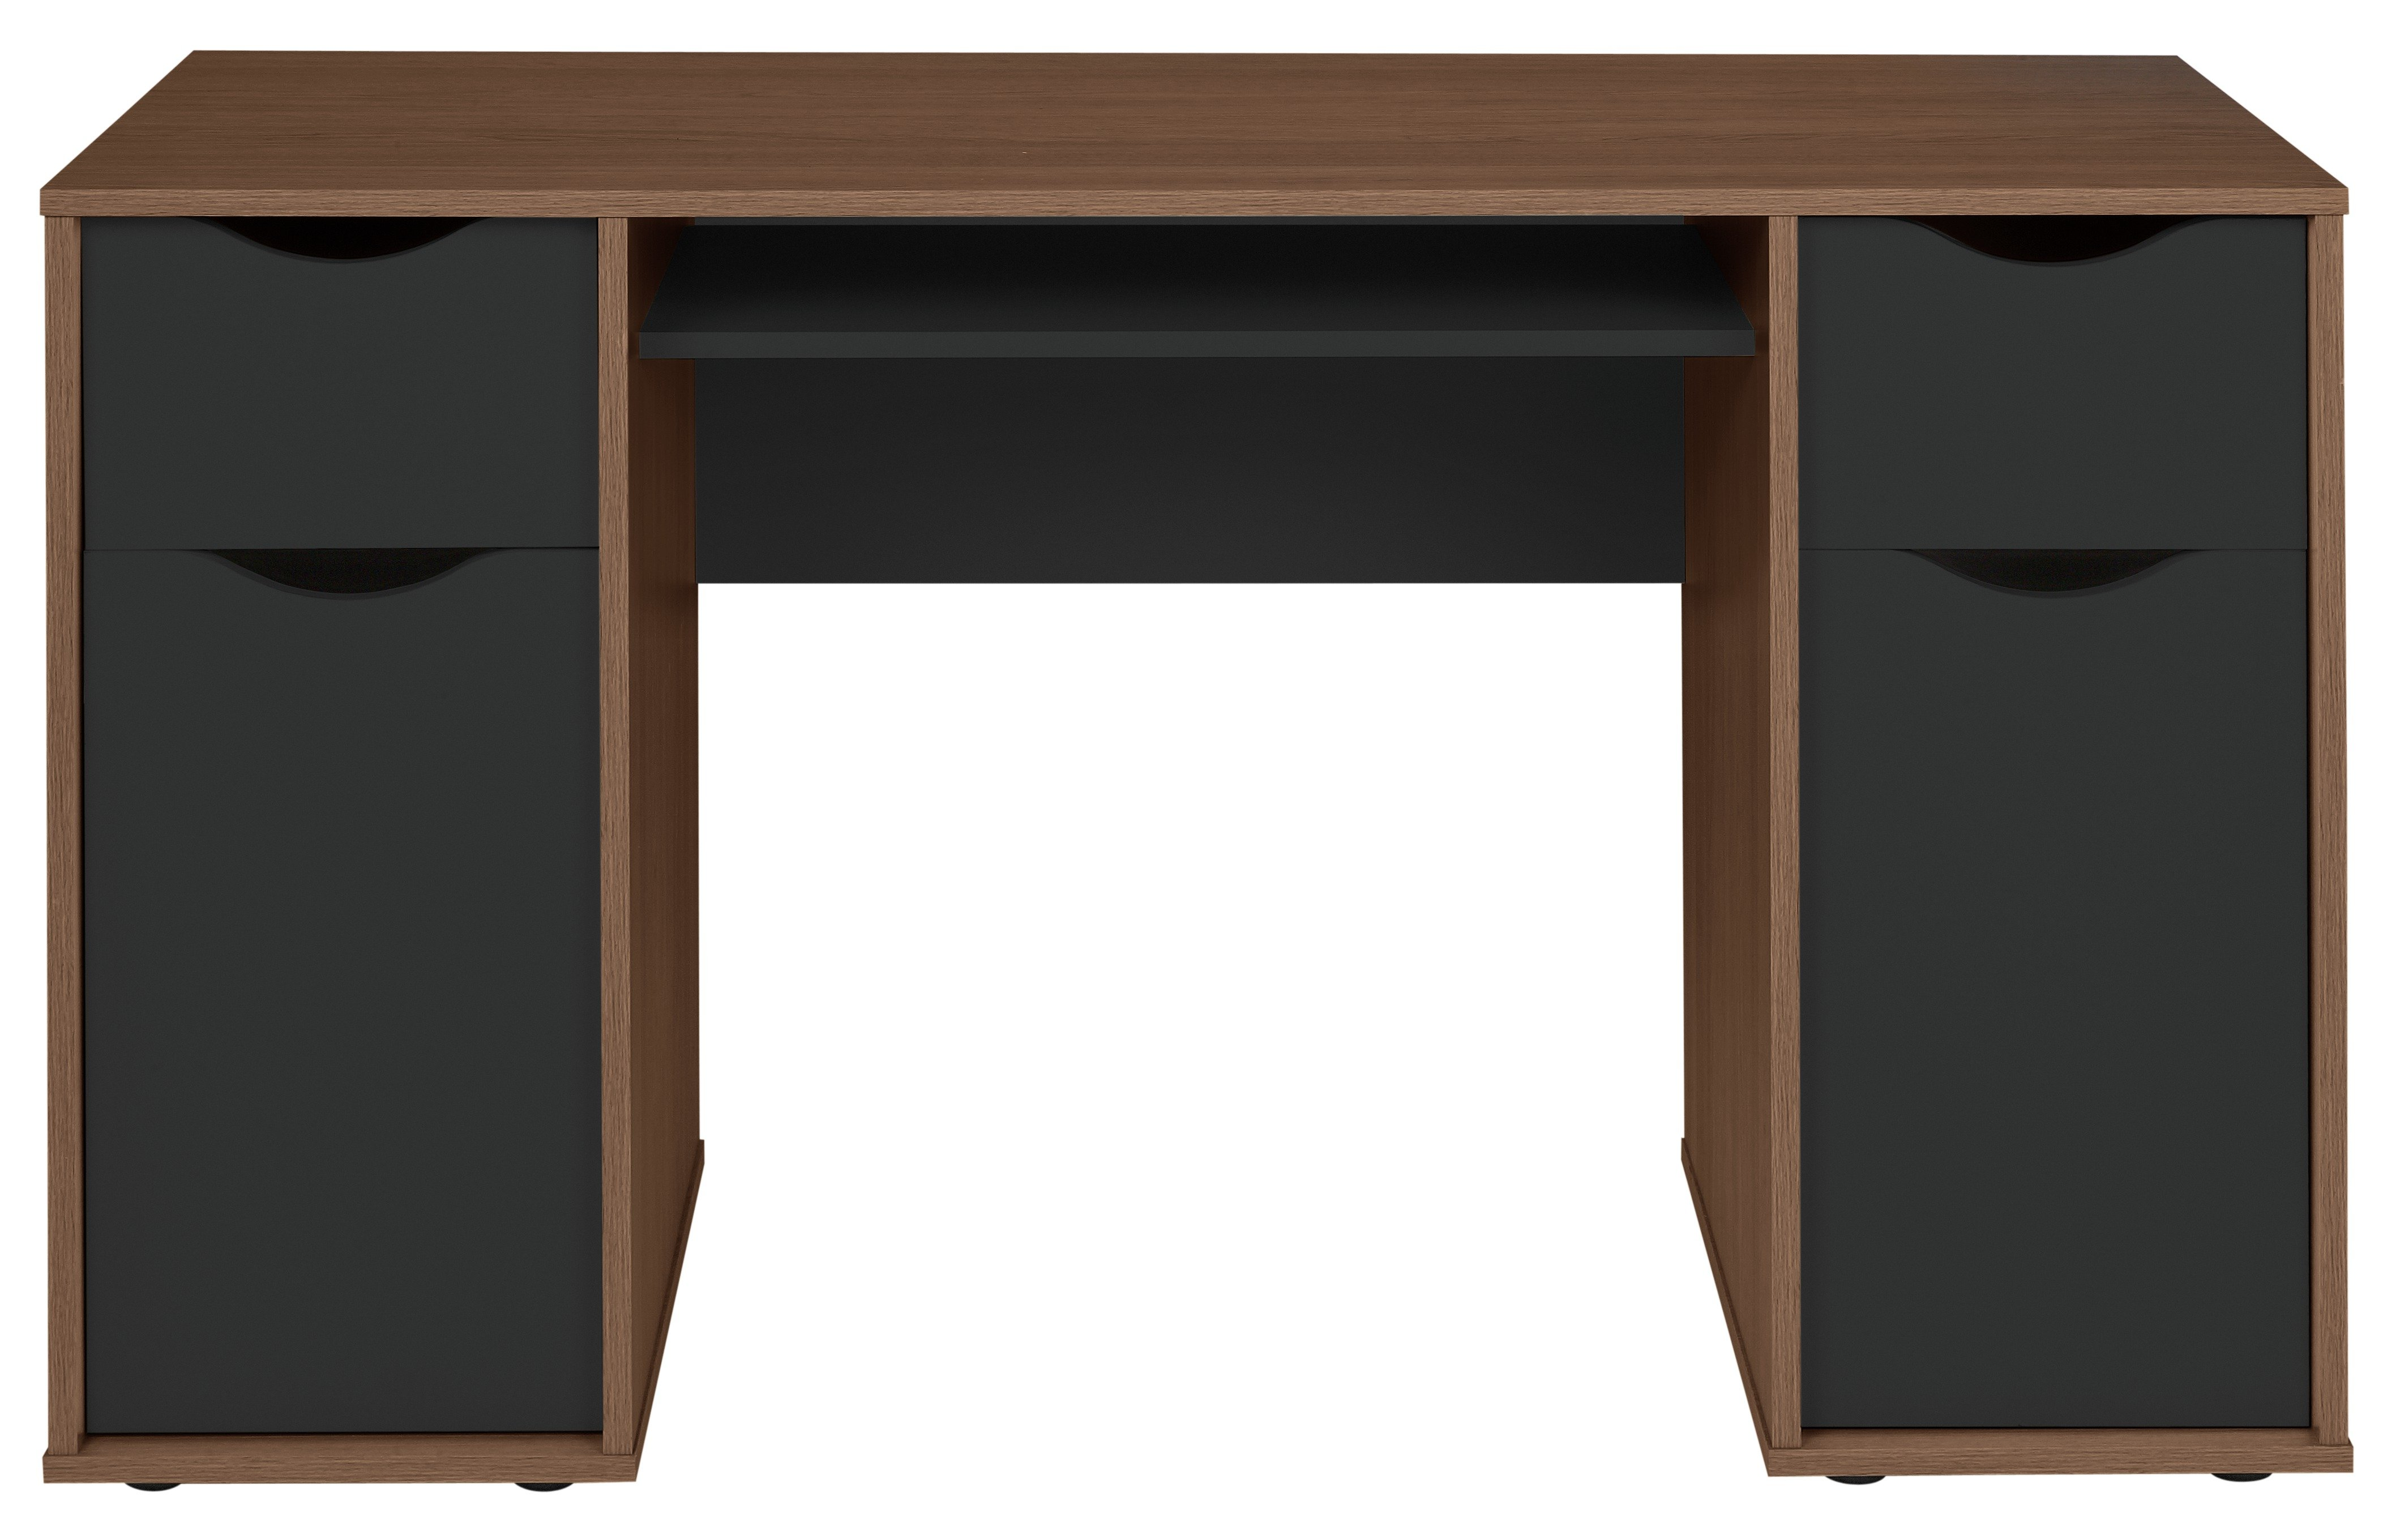 Argos Home Berkeley Pedestal Desk - Black & Walnut Effect